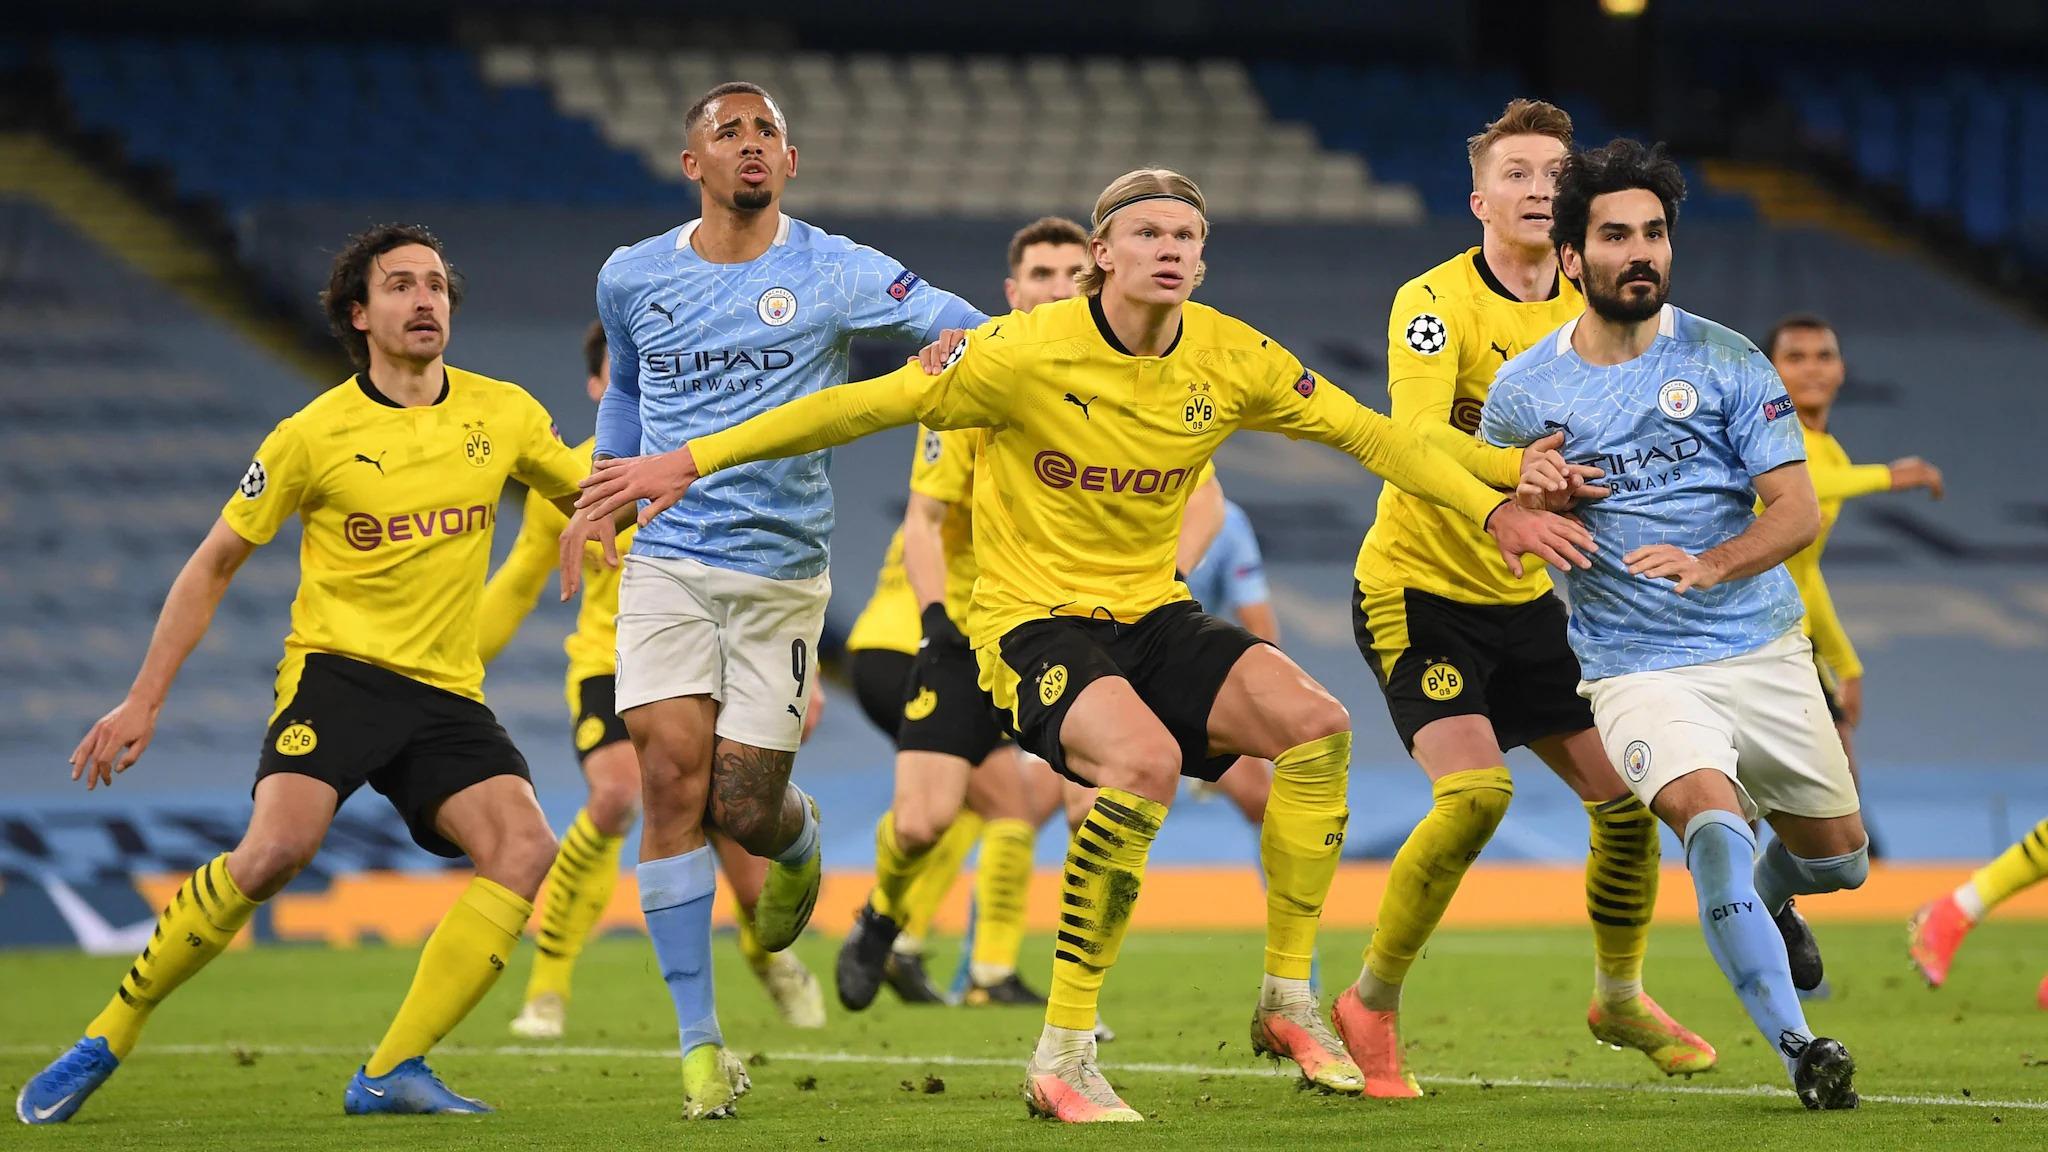 Ratiba za soka-Borussia-dortmund